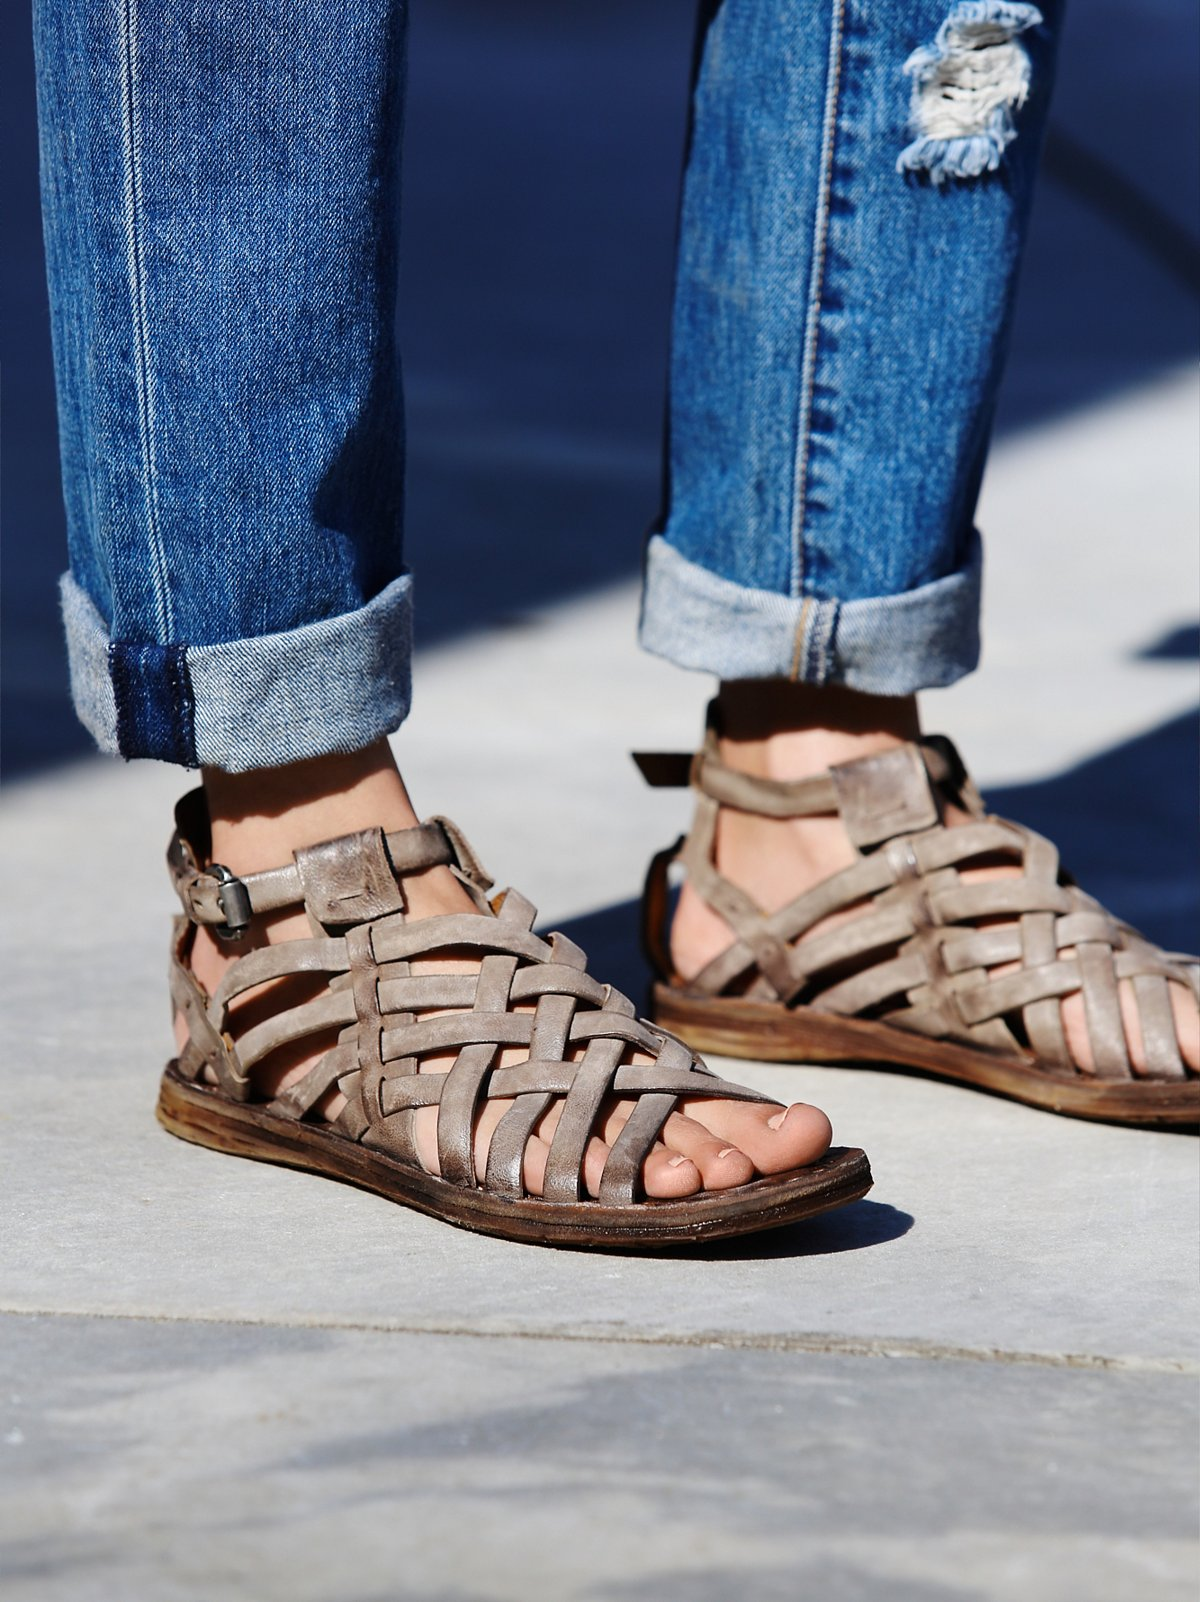 Ralston Interweave Sandal